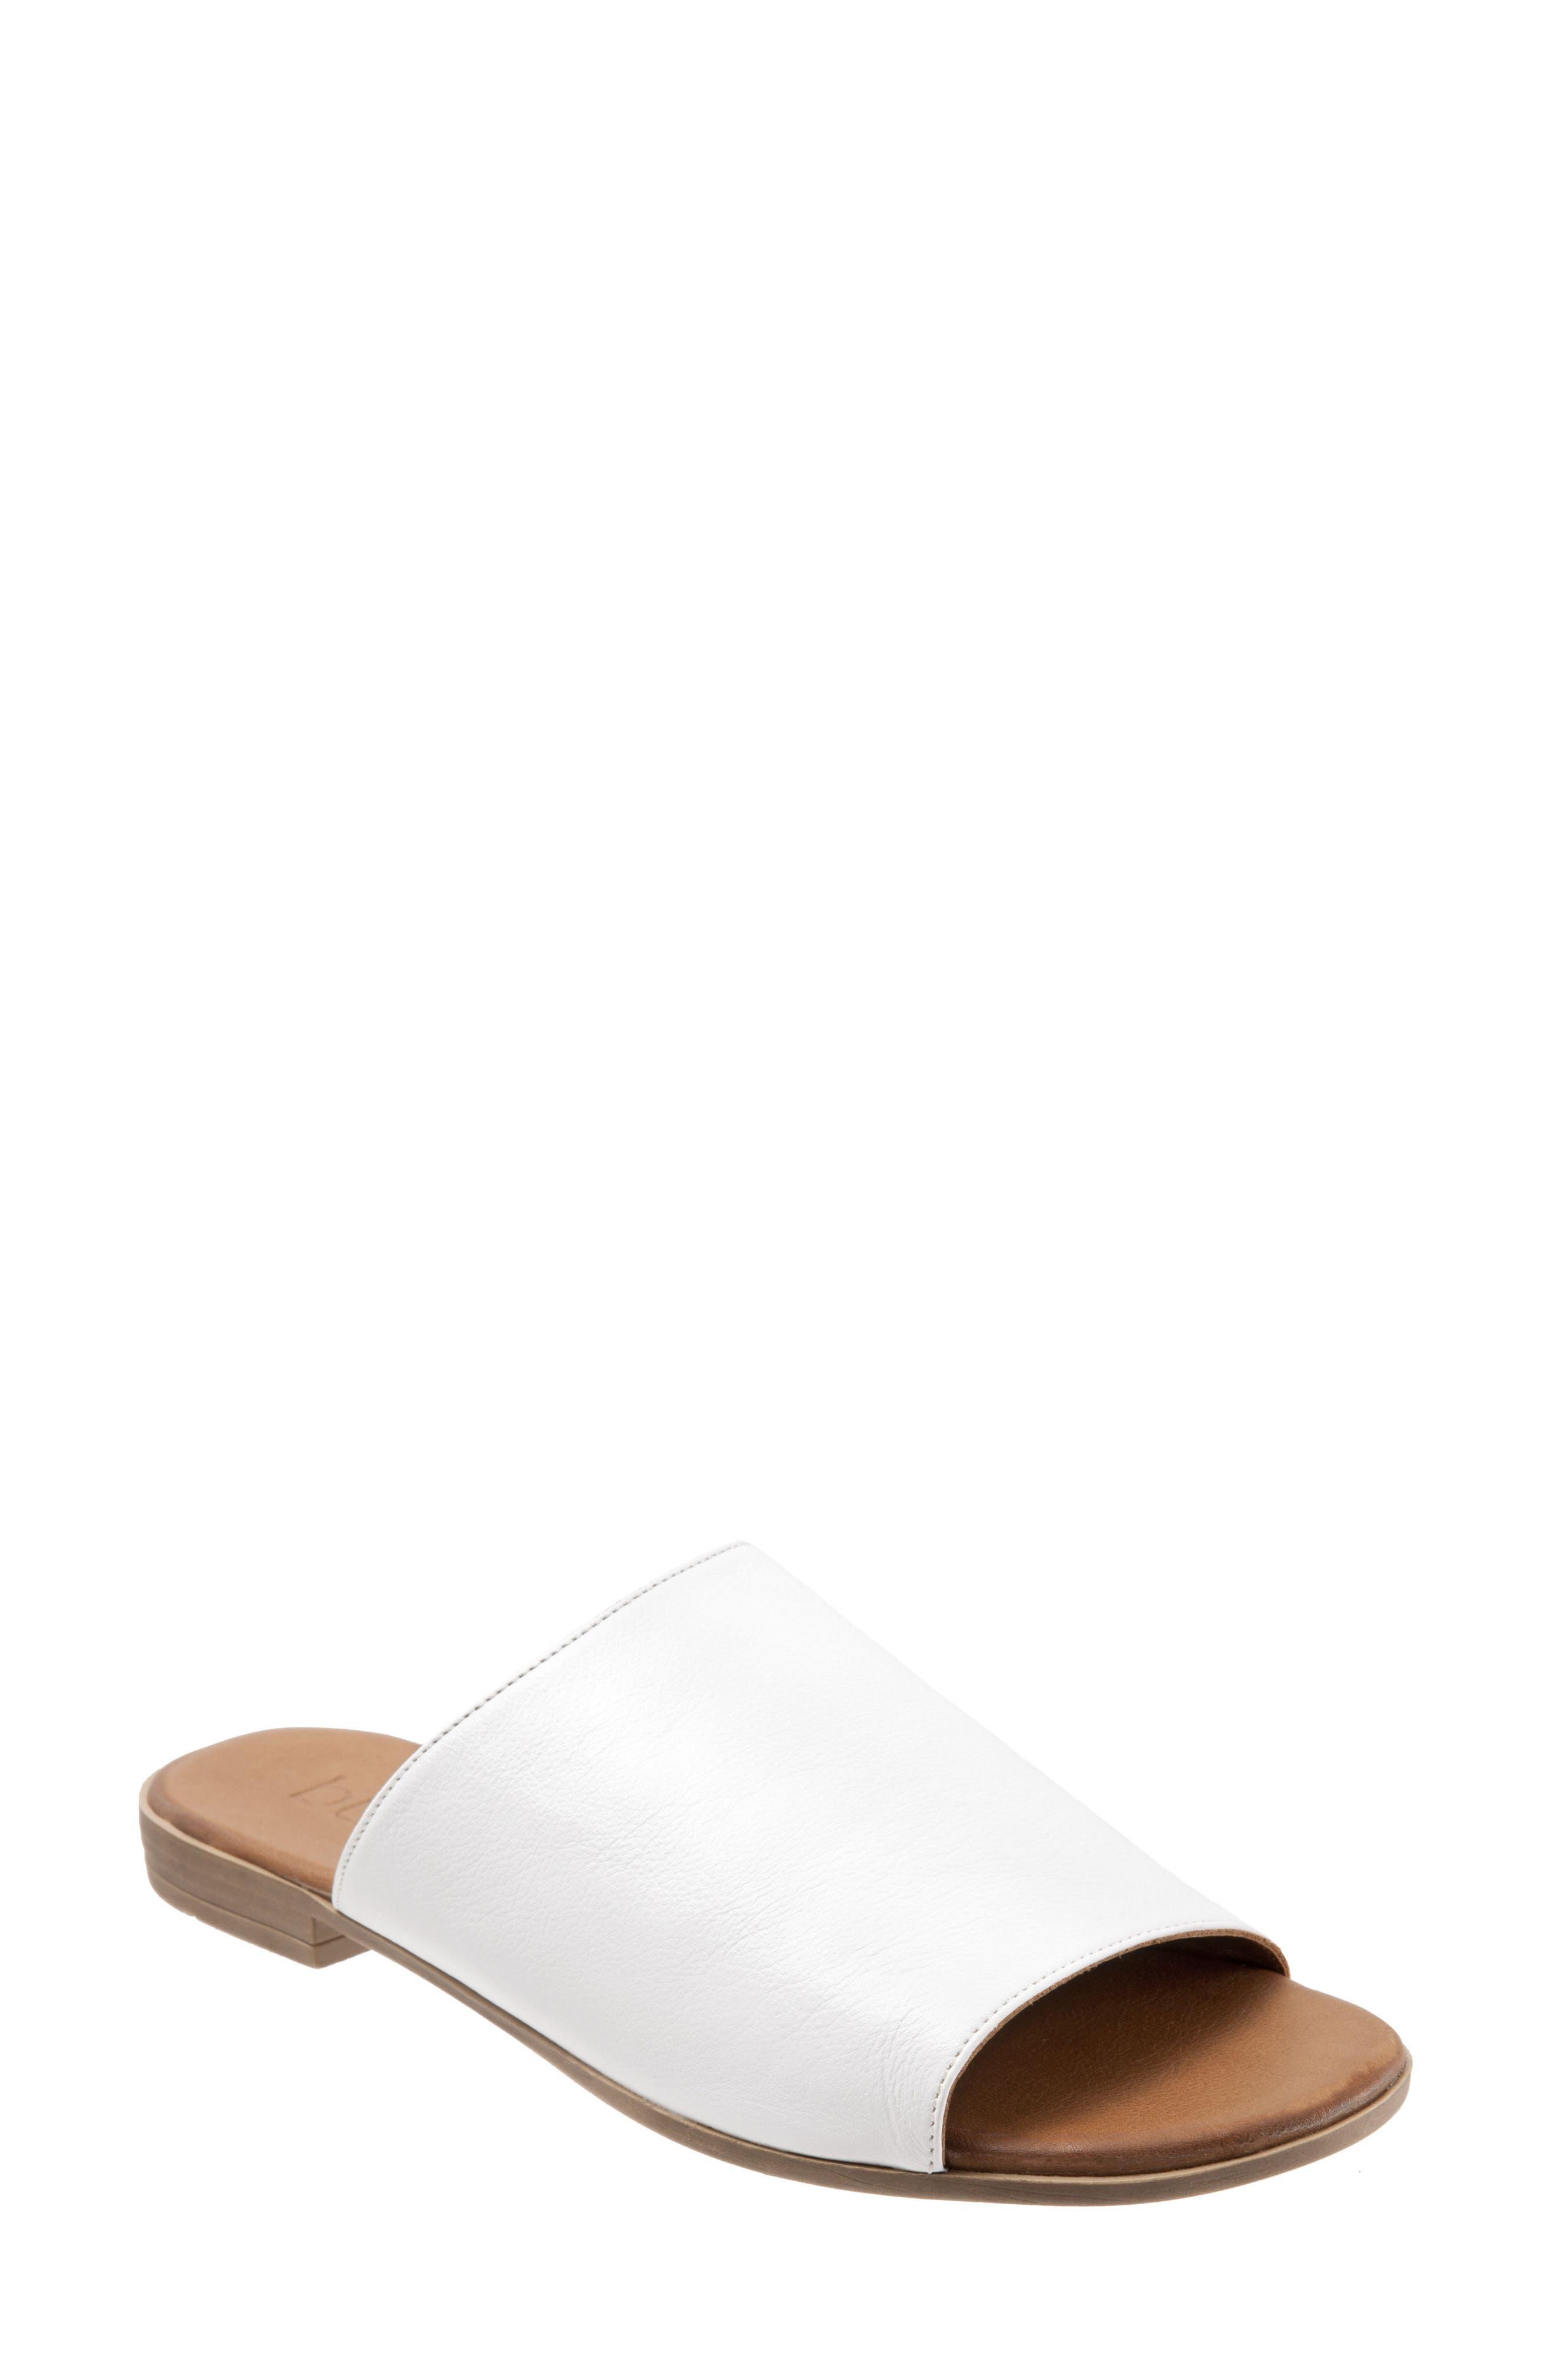 Jory Slide Sandal,                         Main,                         color, White Leather